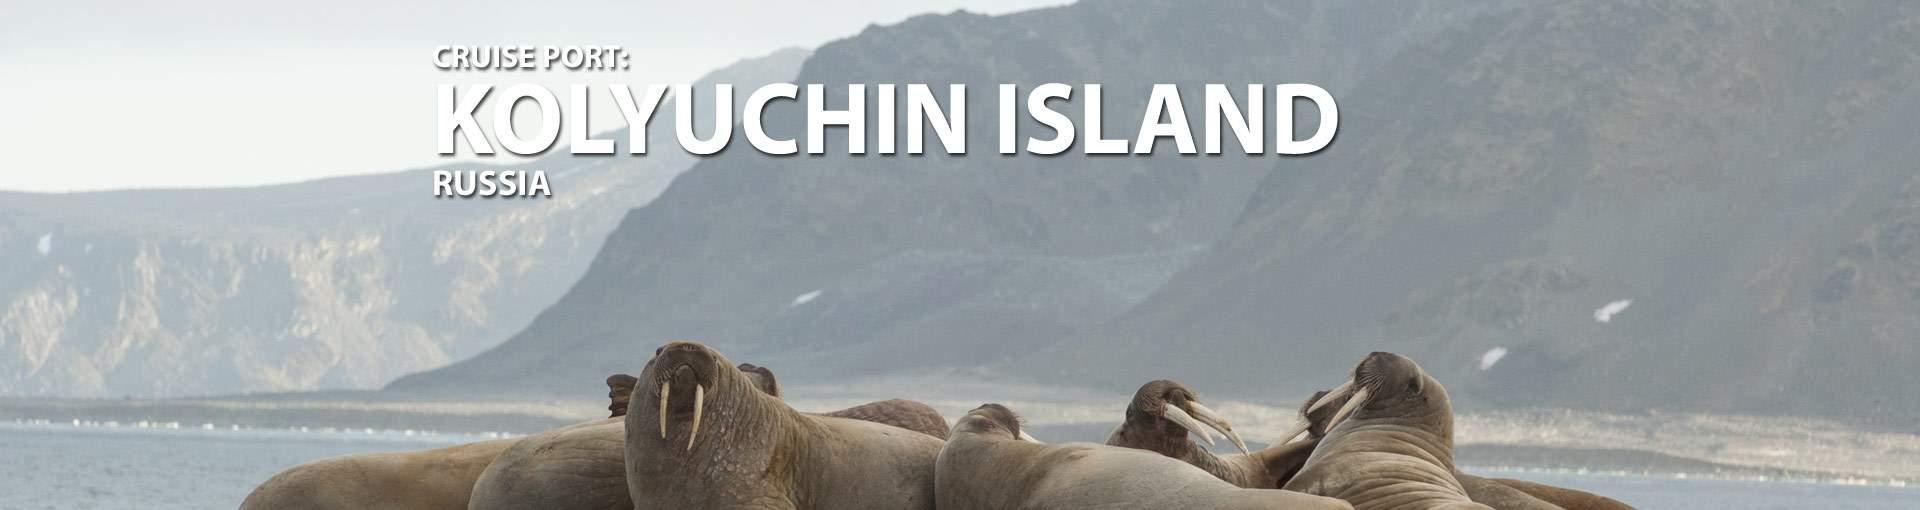 Kolyuchin Island, Russia Cruise Port